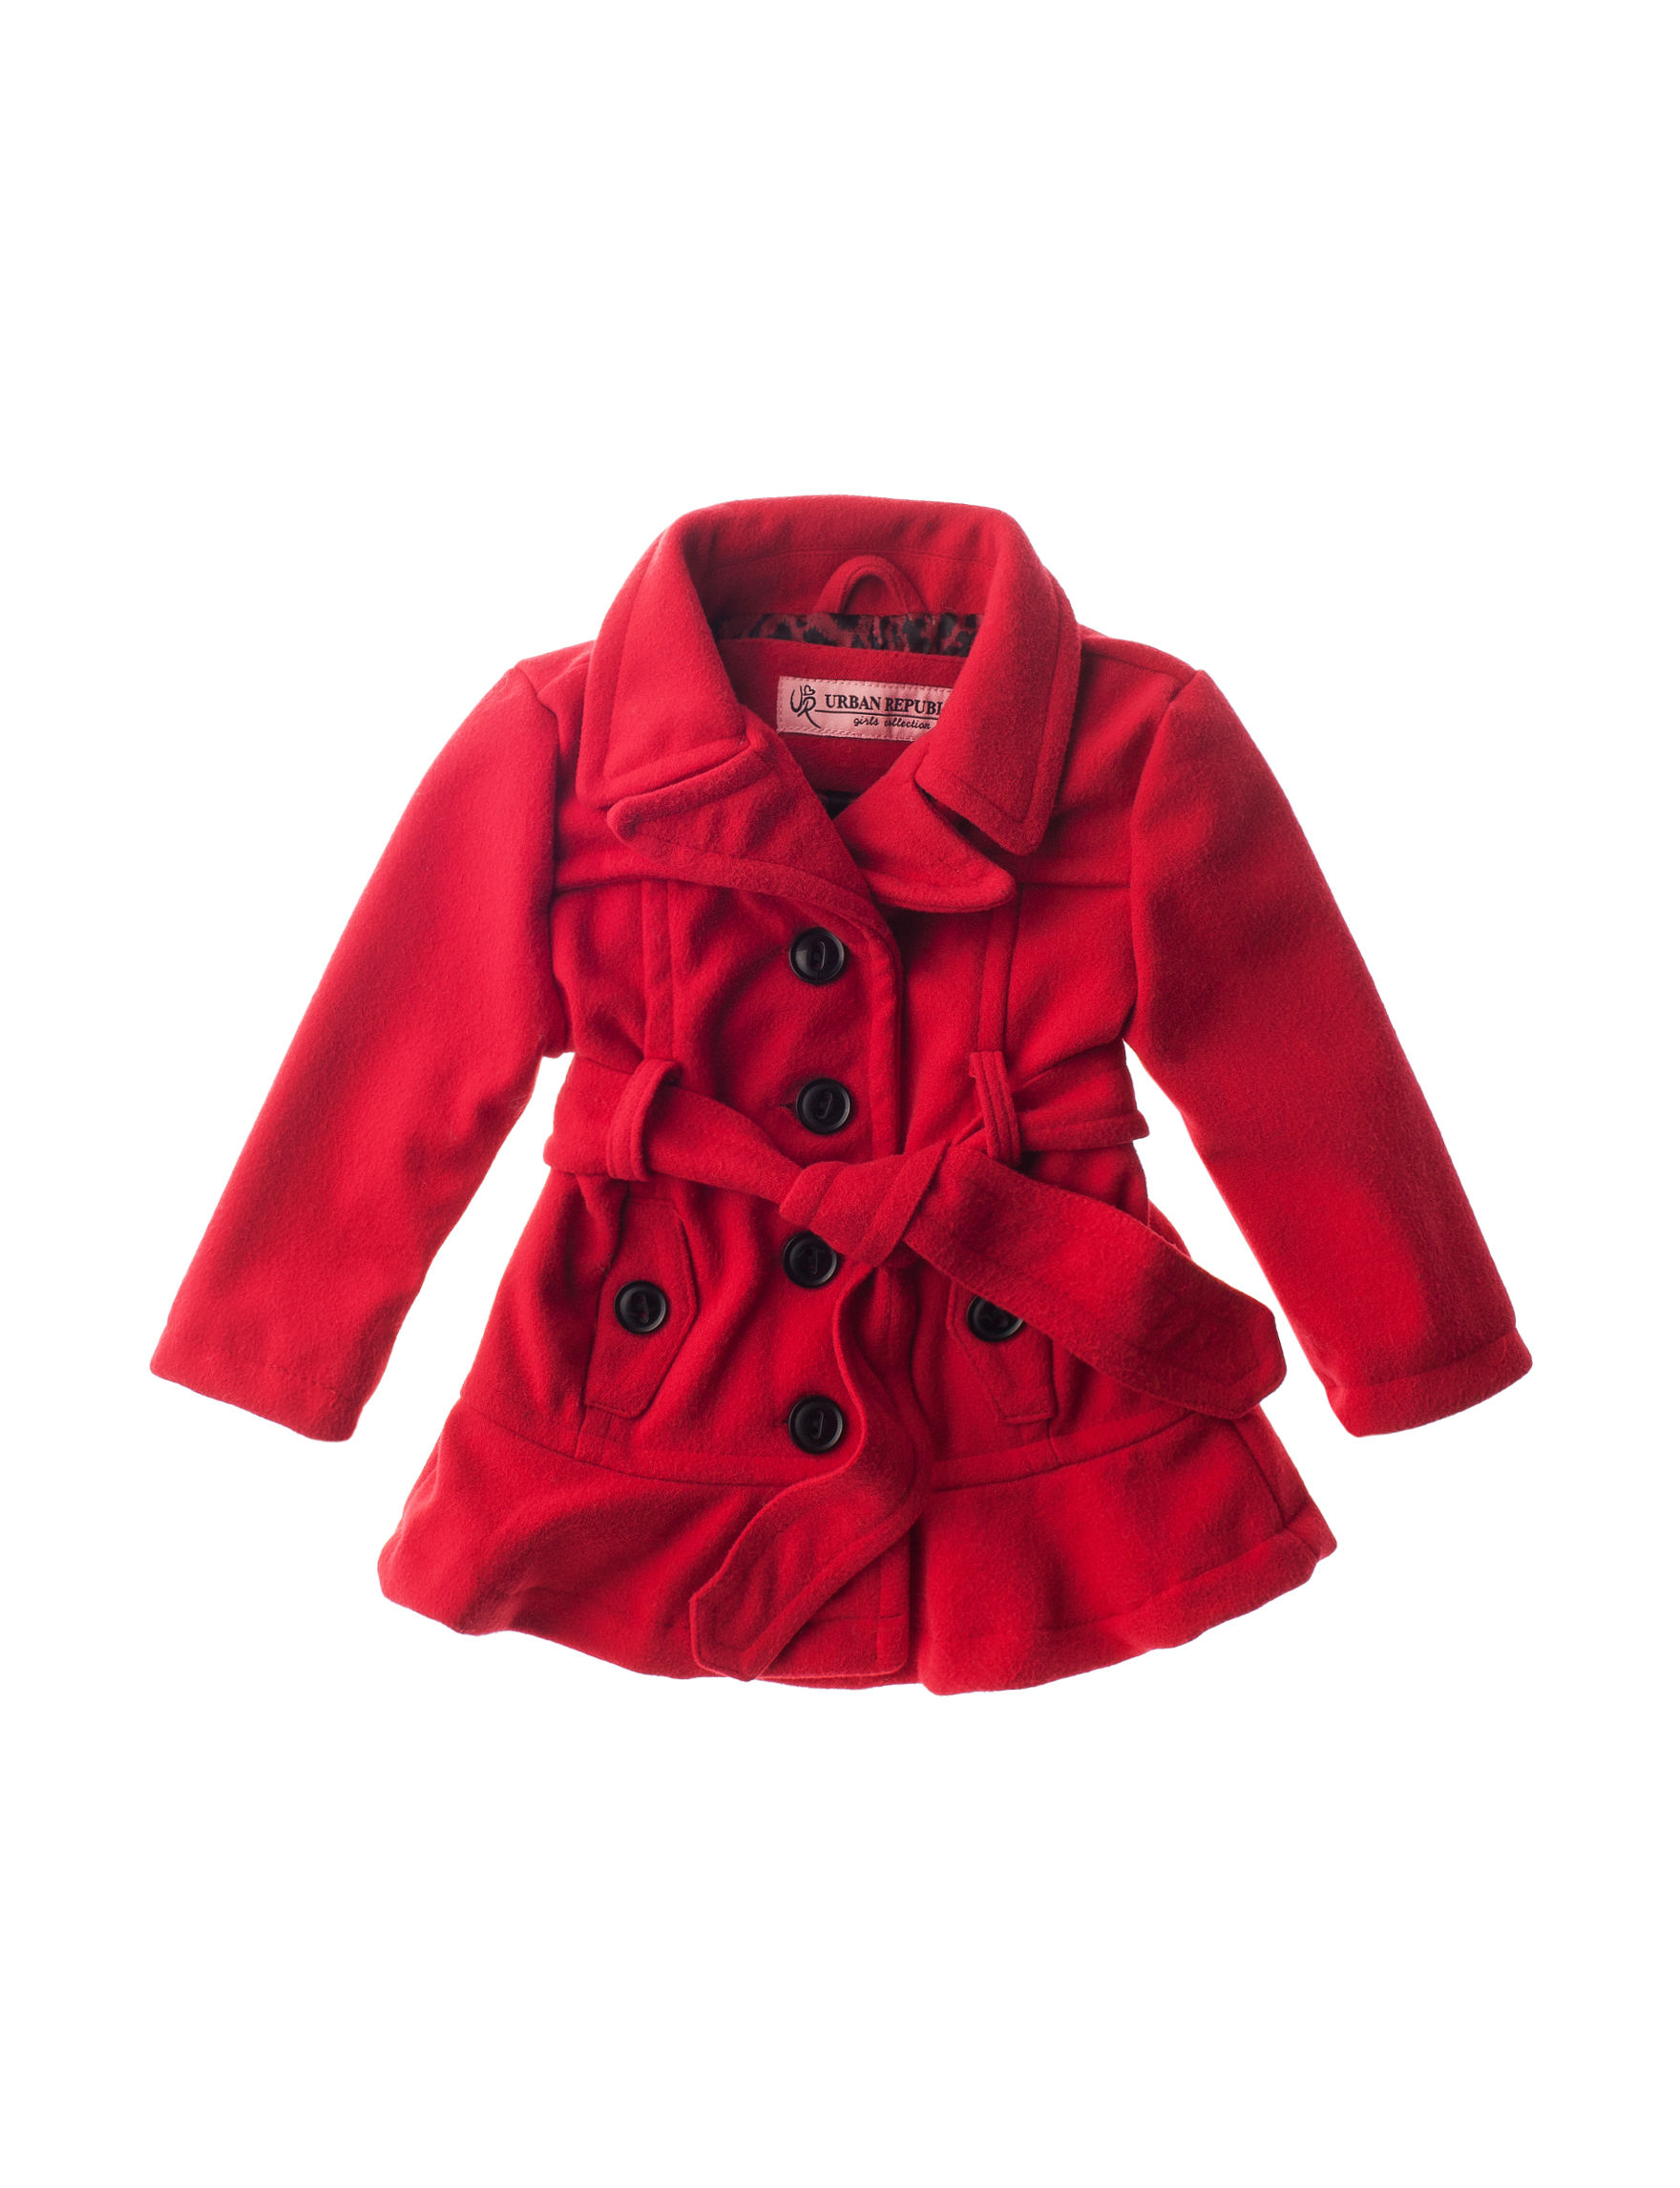 Urban Republic Red Lightweight Jackets & Blazers